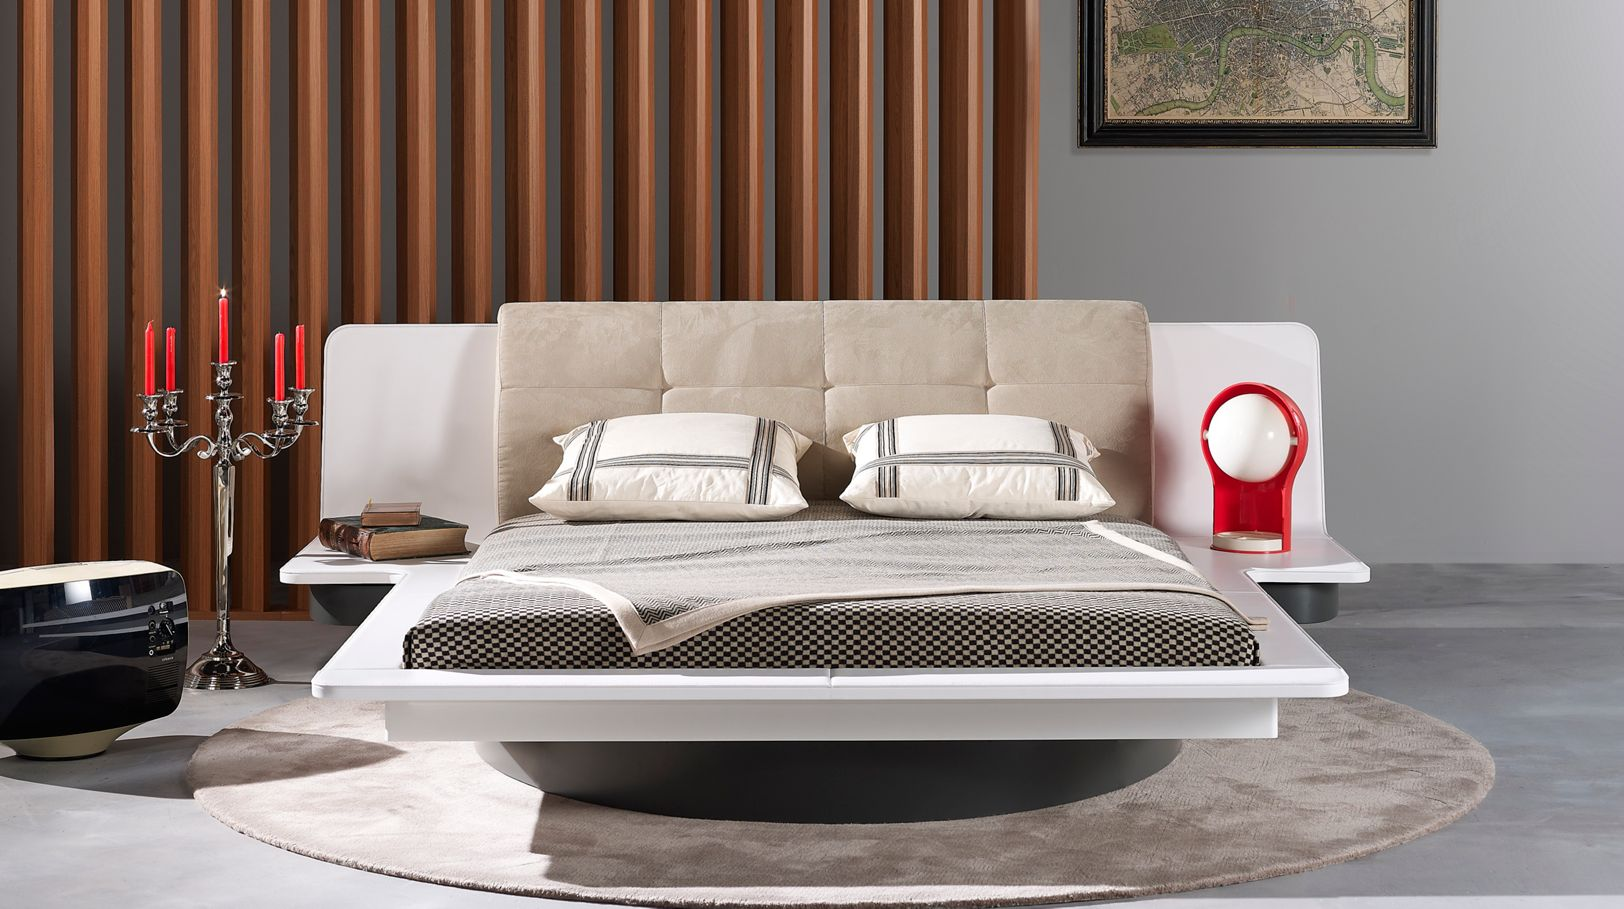 bagatelle commode roche bobois. Black Bedroom Furniture Sets. Home Design Ideas